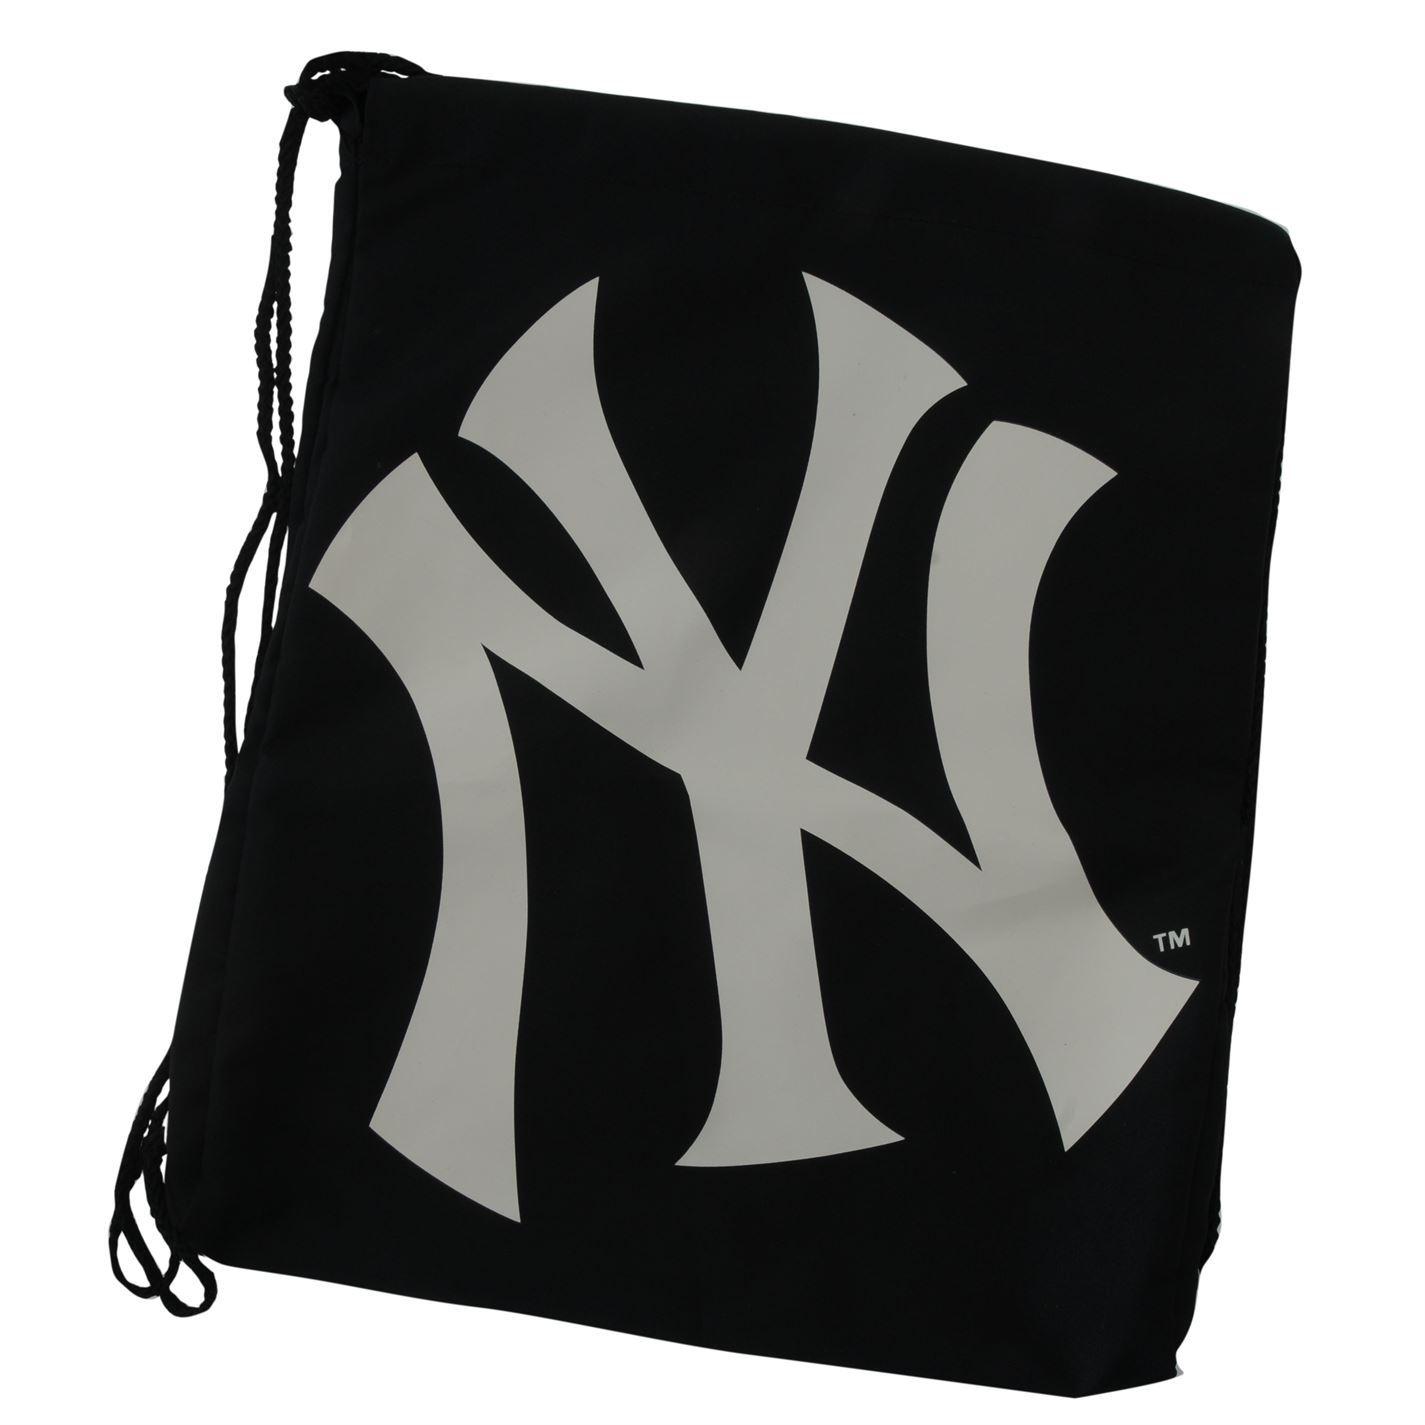 New York Yankees Drawstring Gym Bag Black White School PE Sports Kit Sack